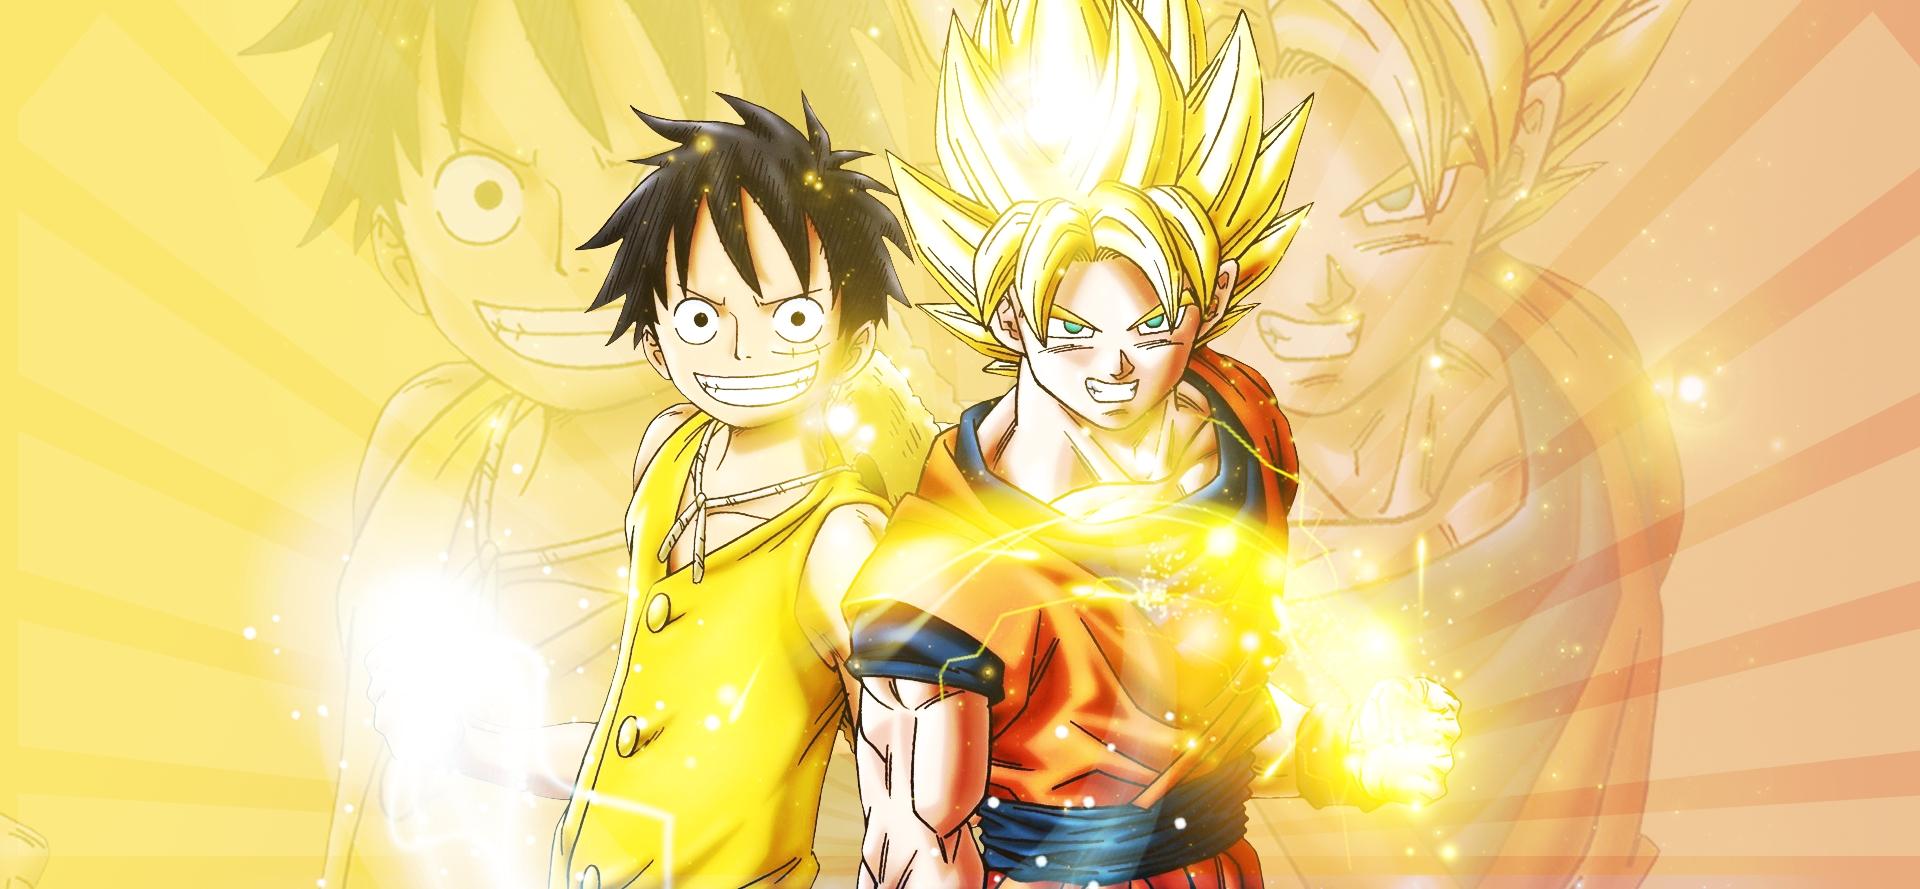 Fonds d'écran Manga Dragon Ball Z SonGoku x Luffy